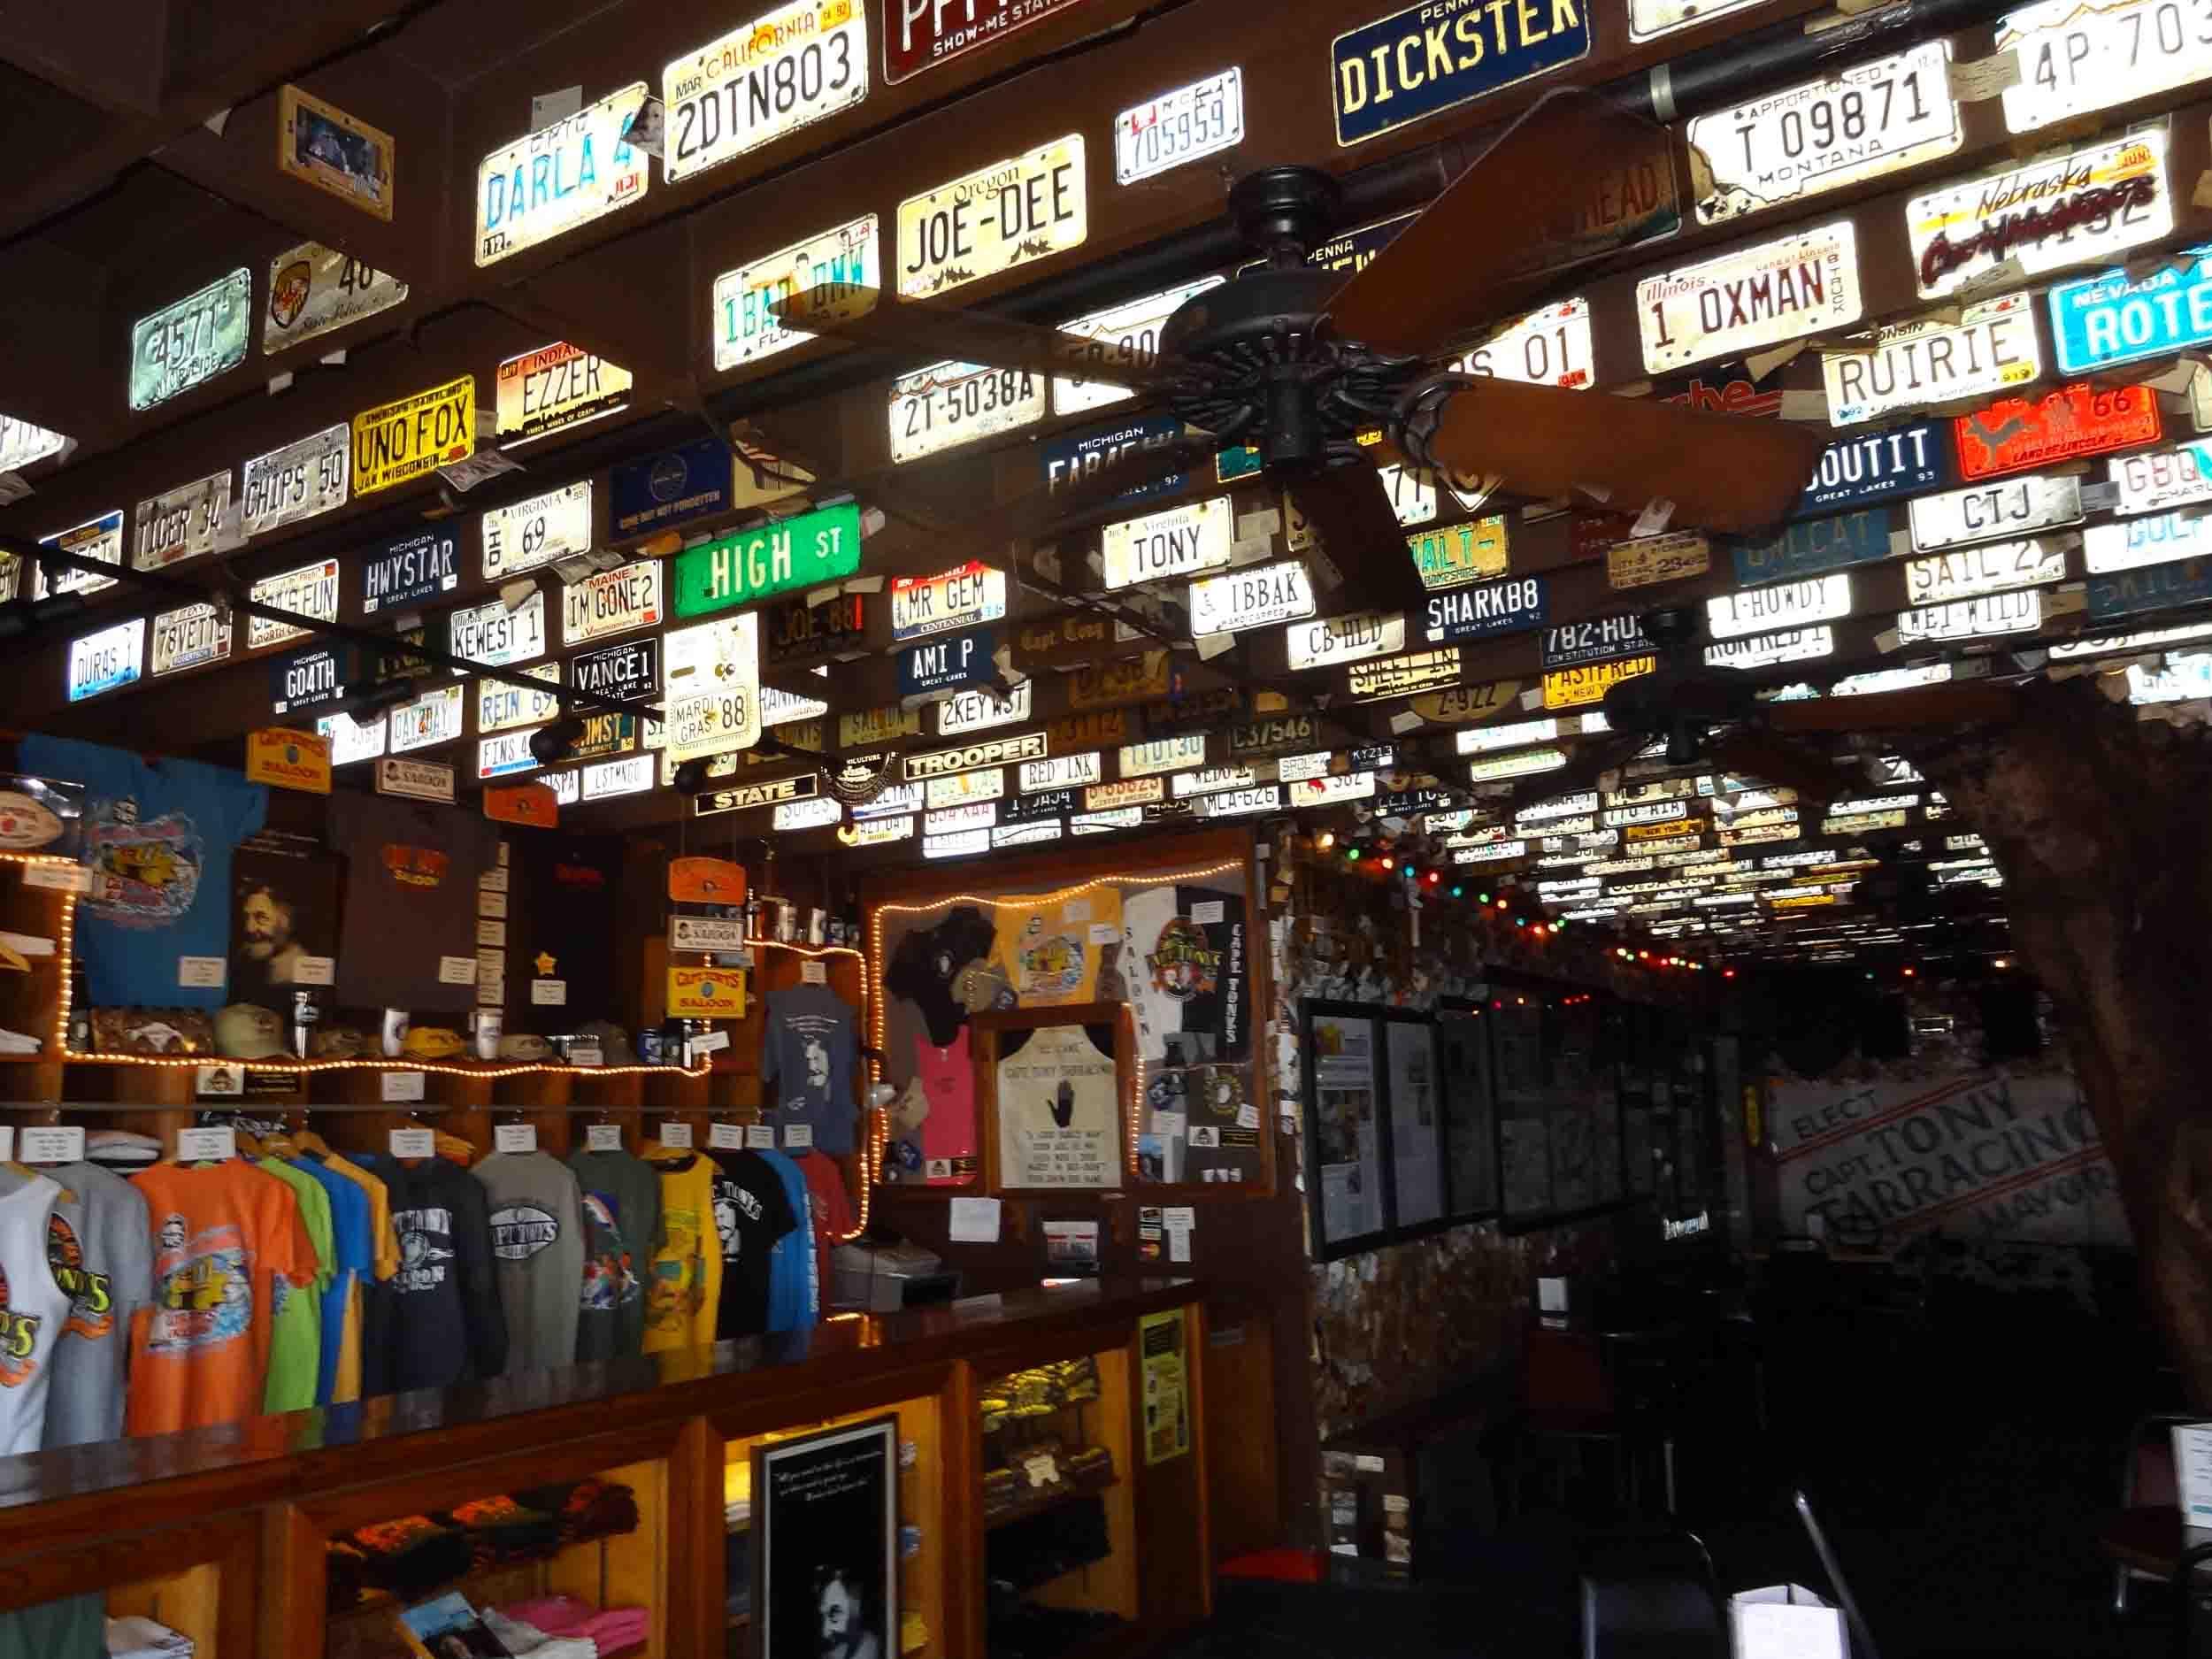 Captain Tony's Saloon Merchandise